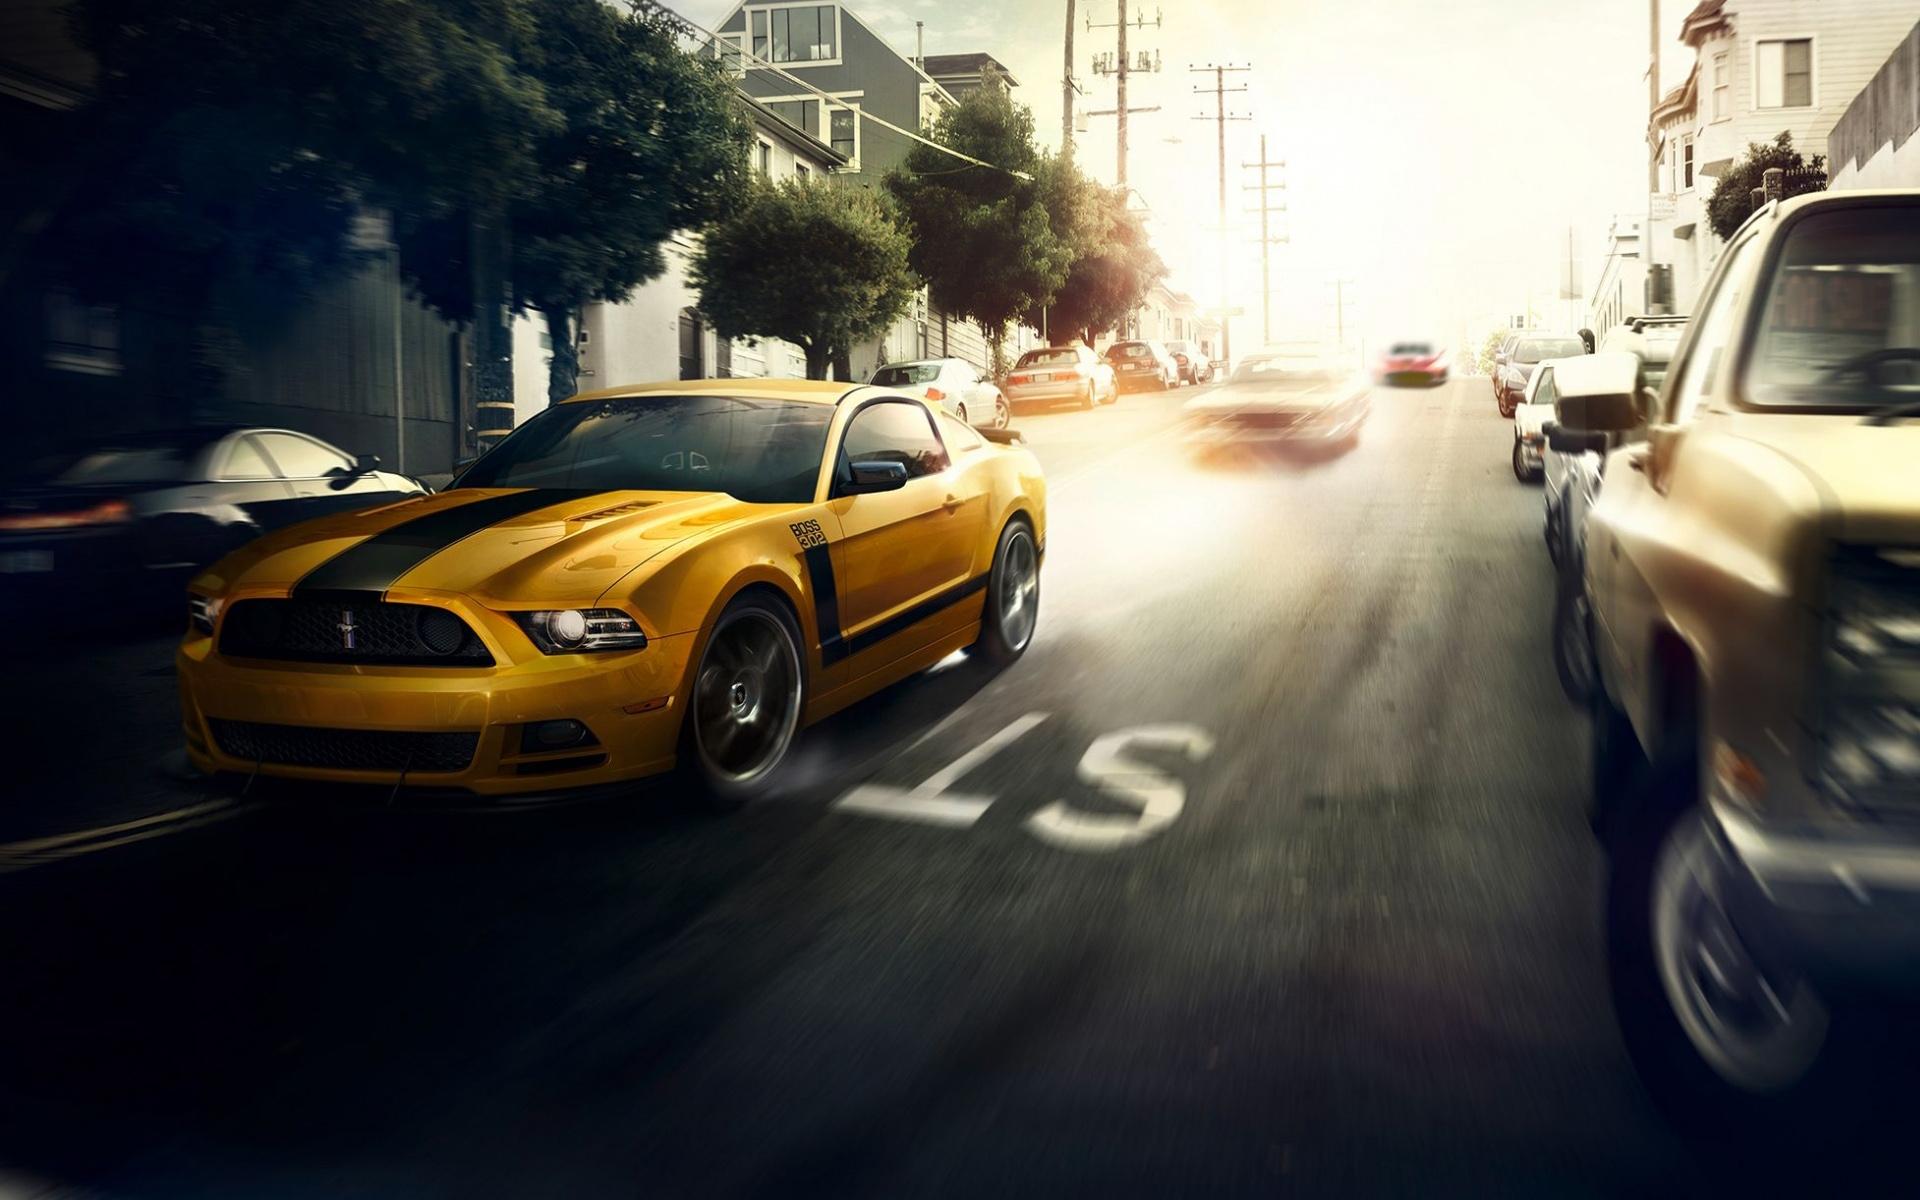 American Muscle Car Wallpaper Mobile Ford Mustang Boss 302 Wallpaper Hd Car Wallpapers Id 5669